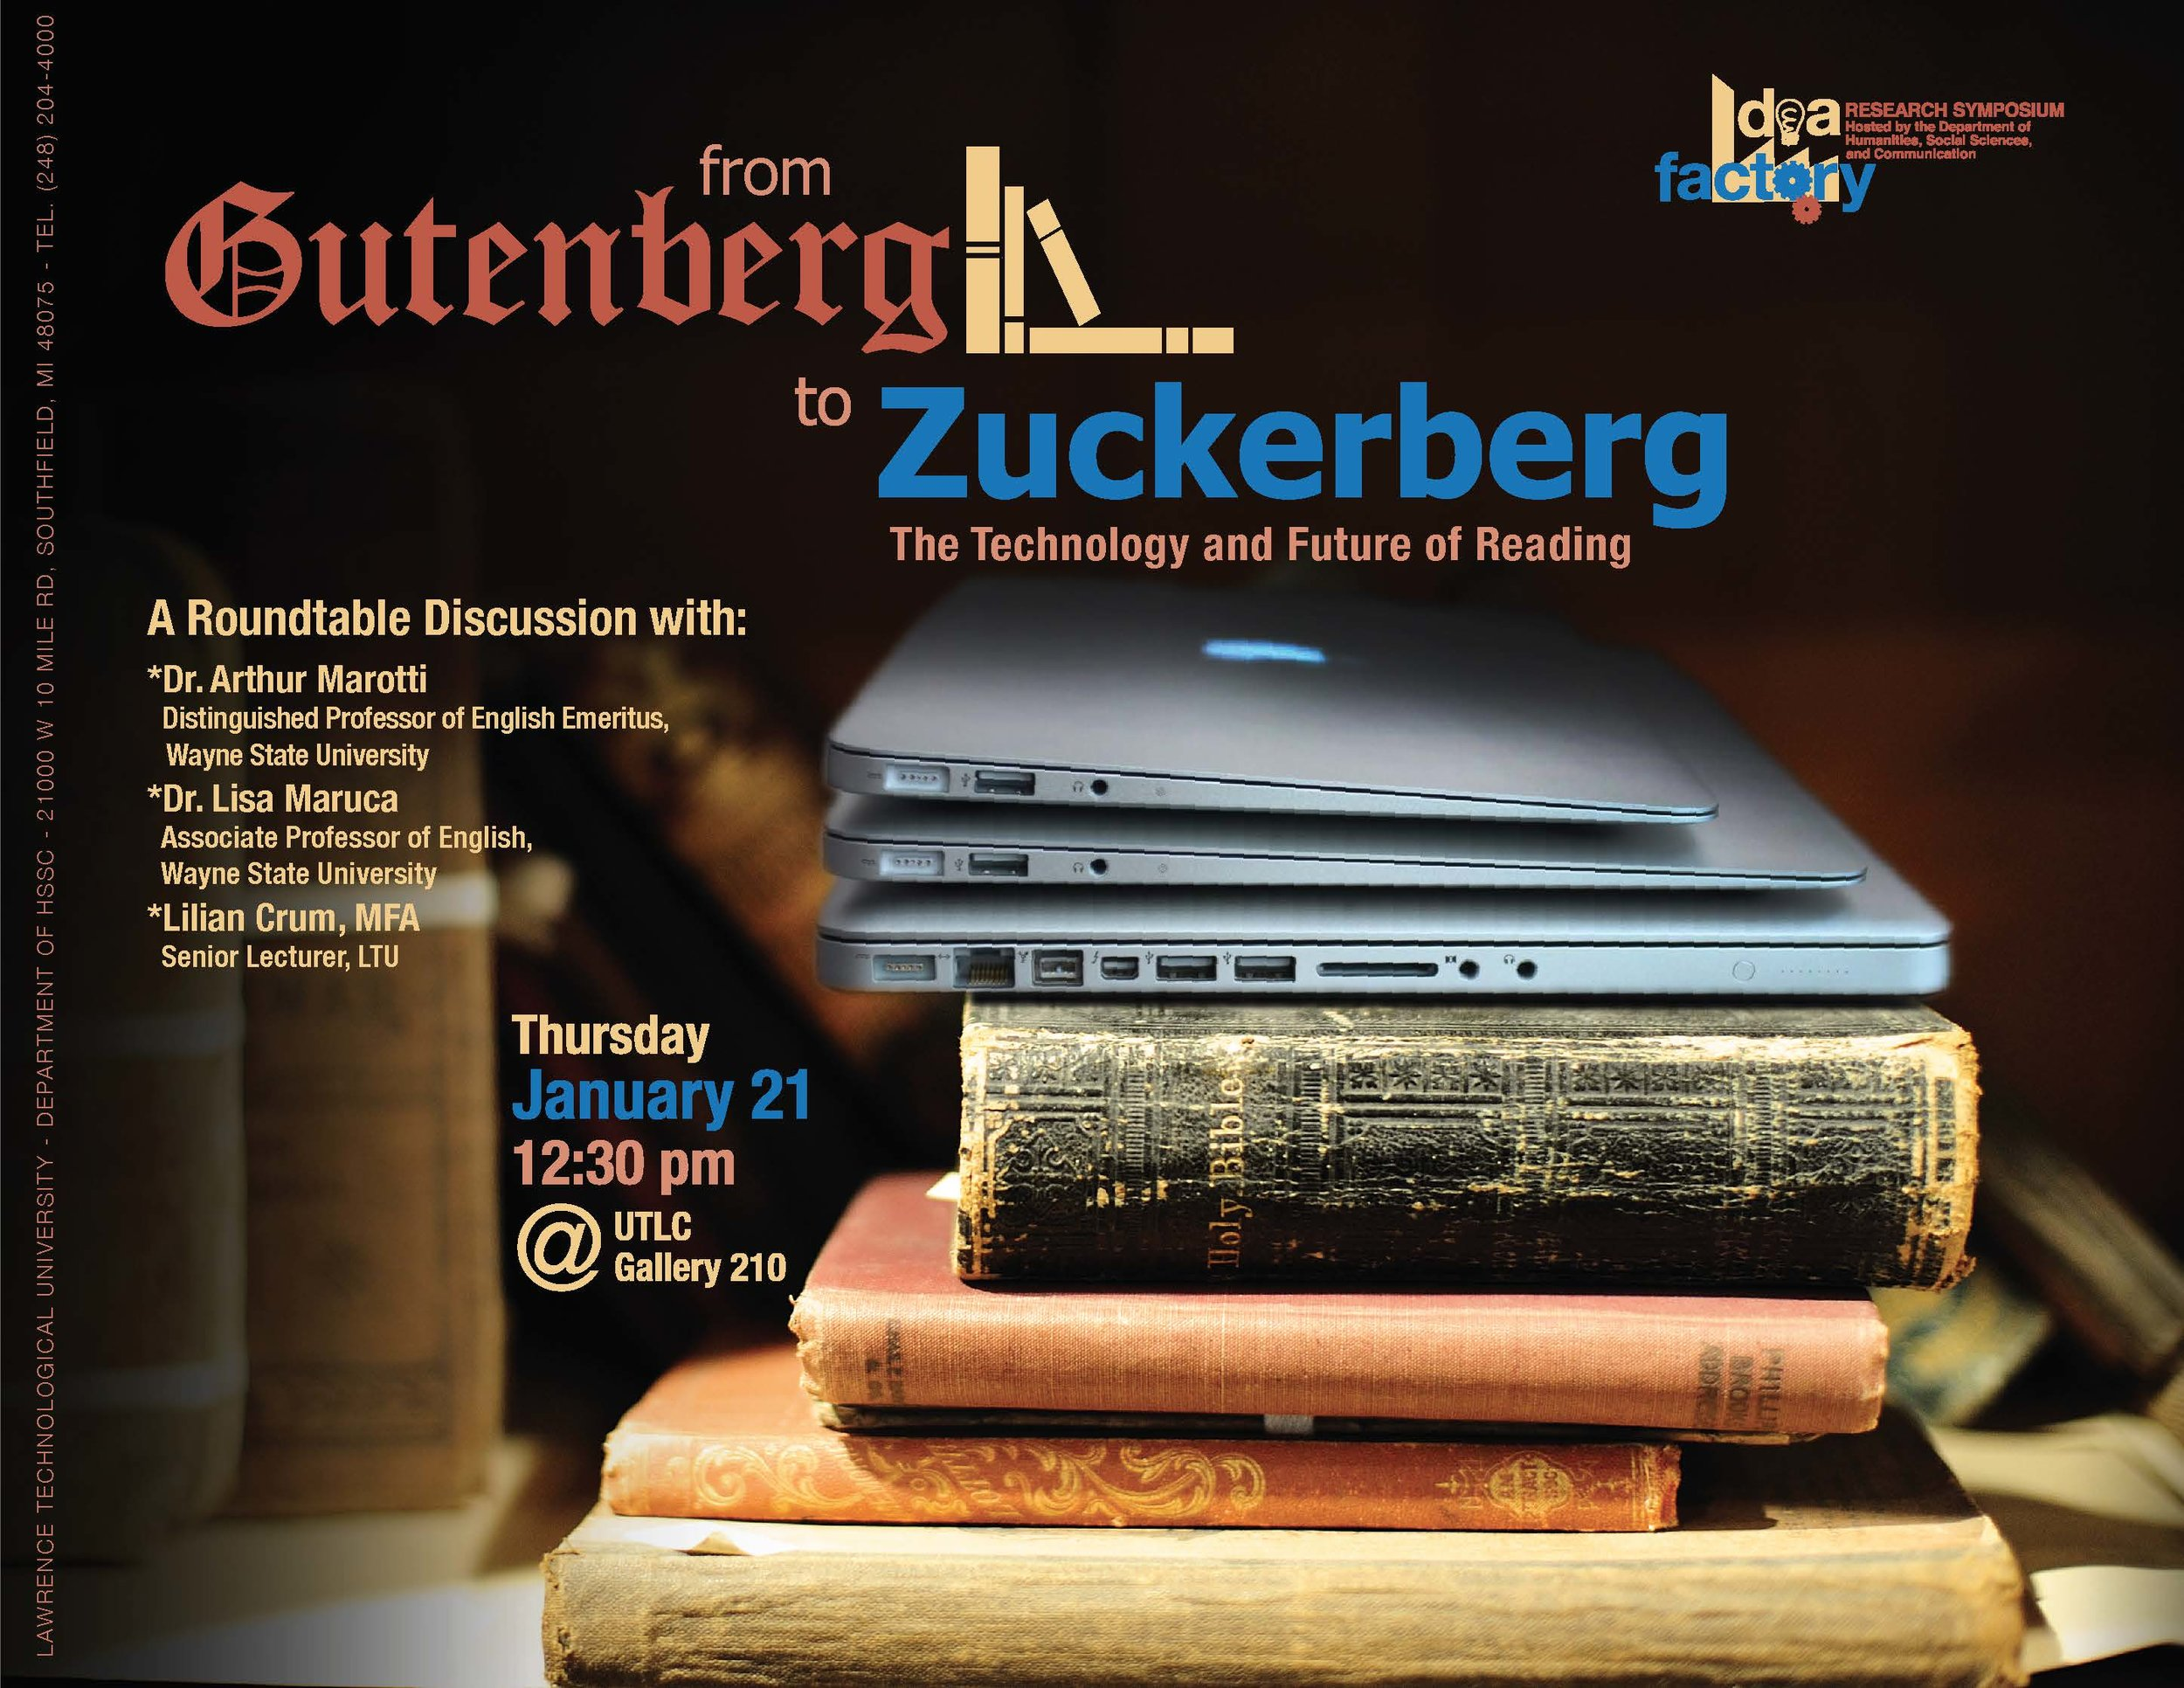 Gutenberg_Zuckerberg.jpg